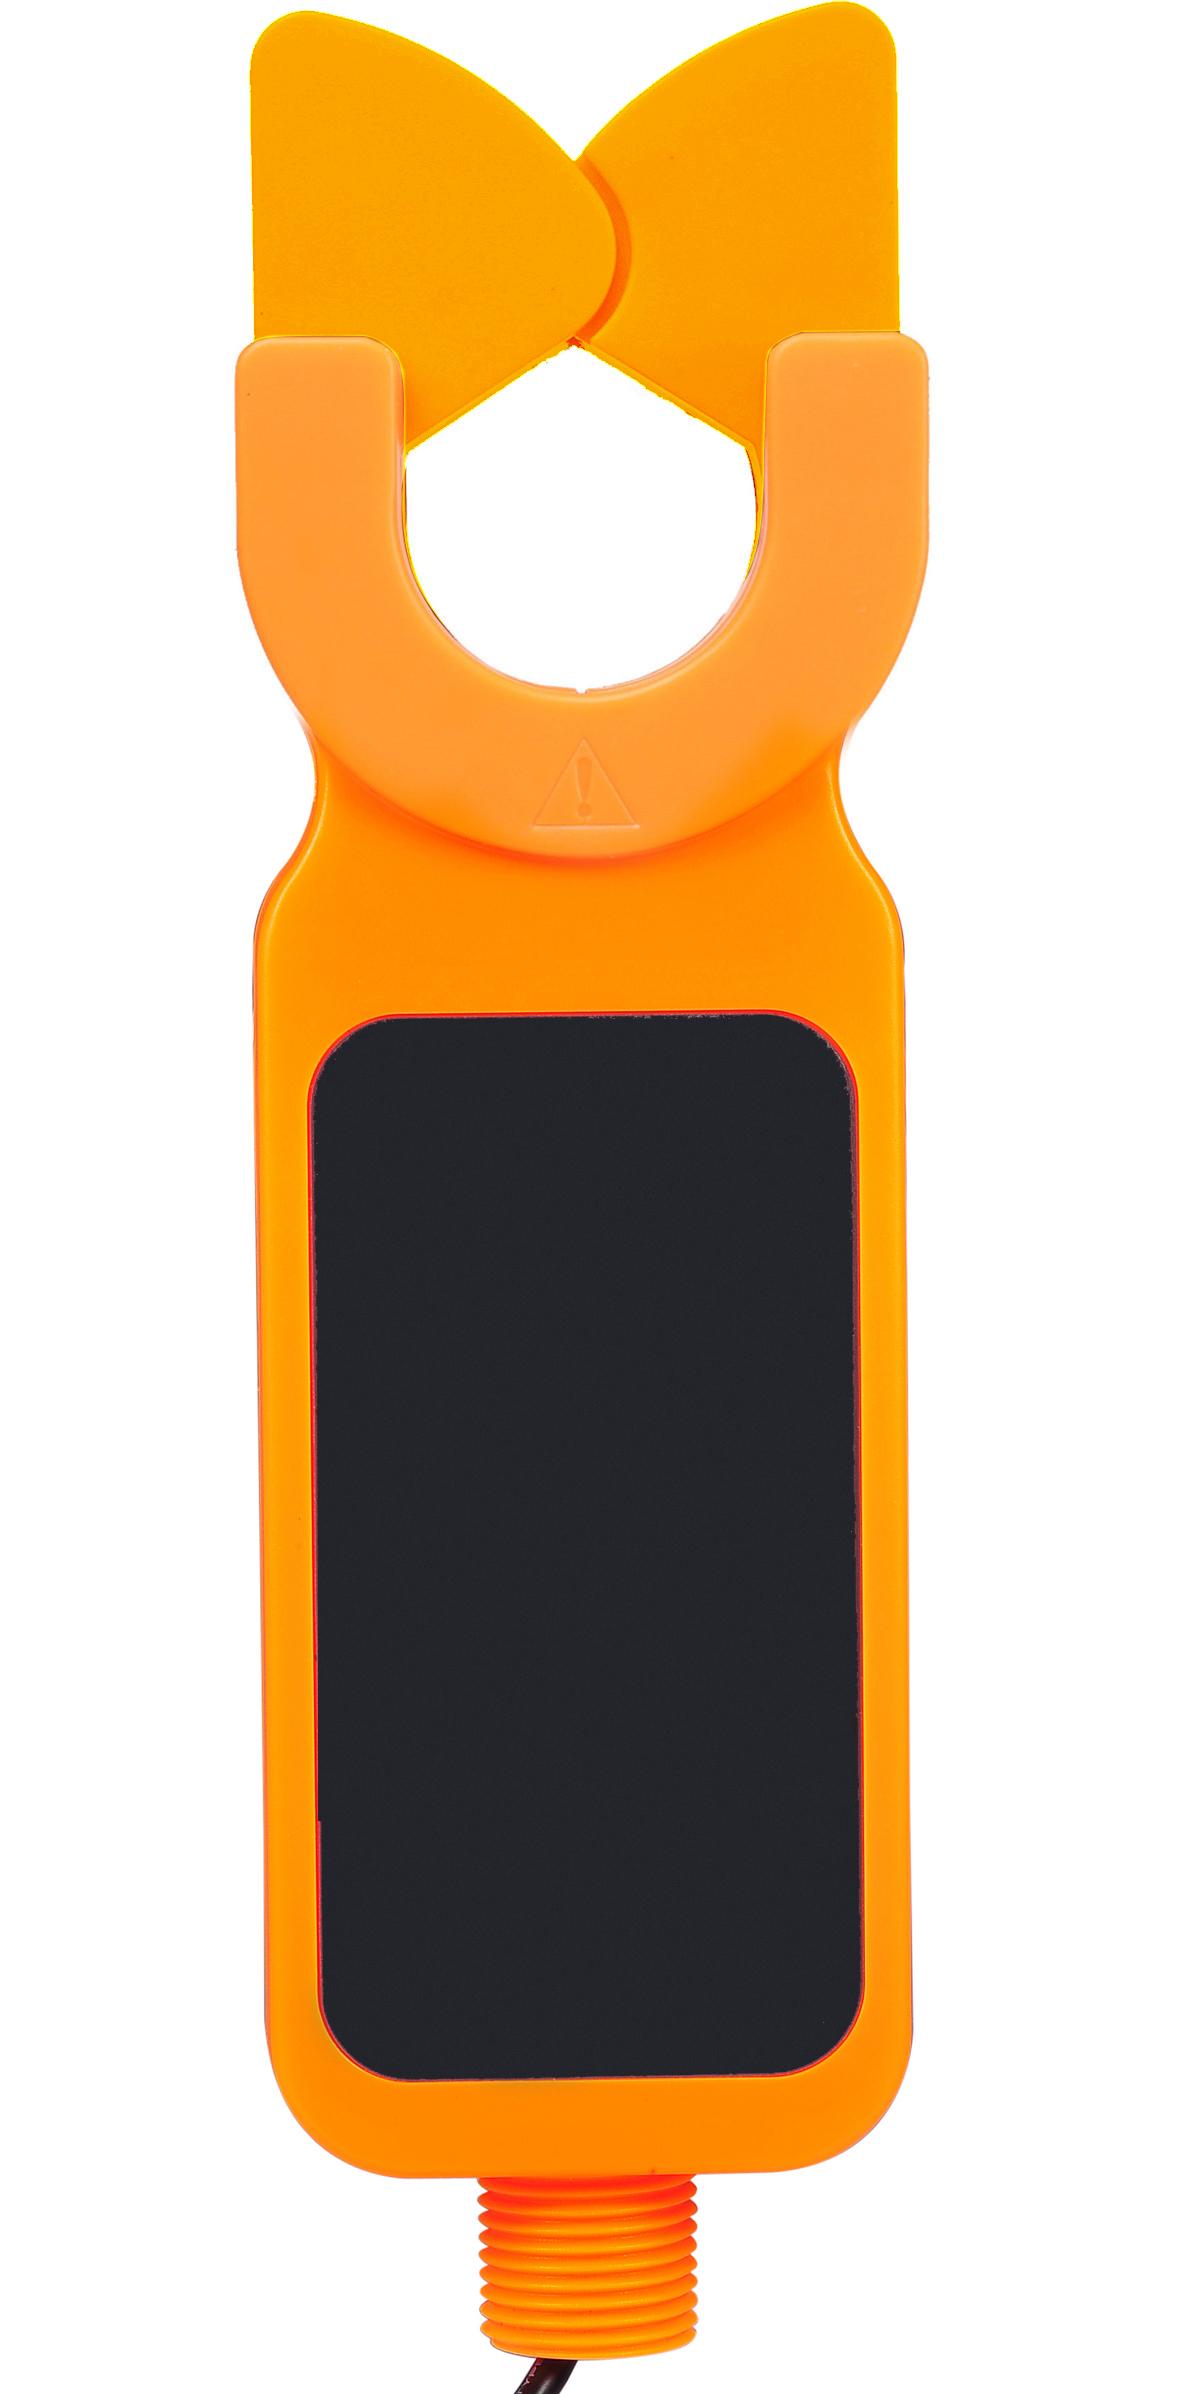 ETCR033H High Voltage Clamp Leakage Current/Current Sensor -etcr